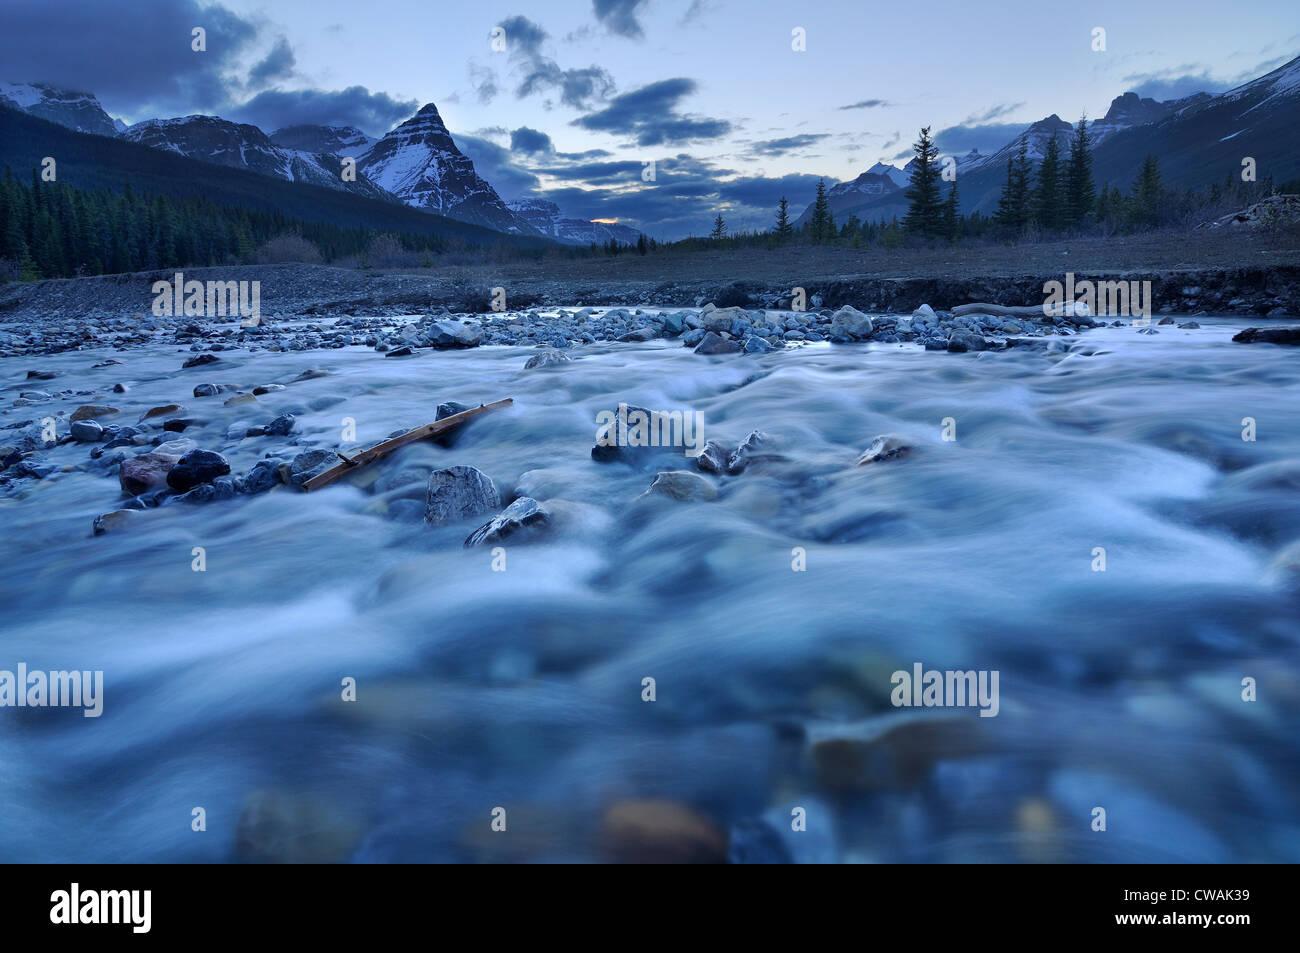 Silverhorn Creek, Banff National Park, Alberta, Canada Photo Stock